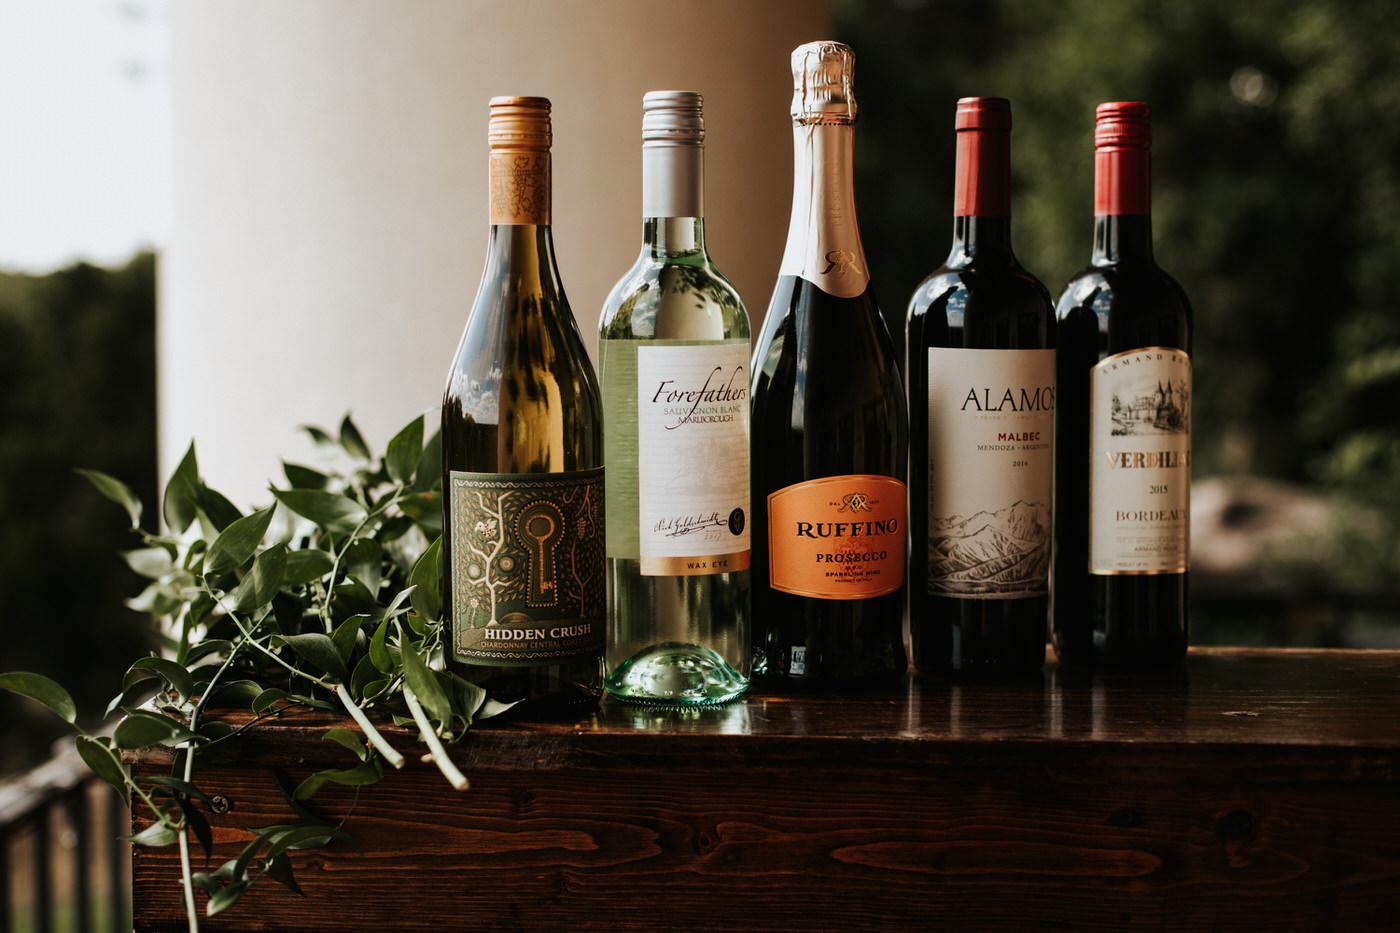 Wine bottles at wedding reception